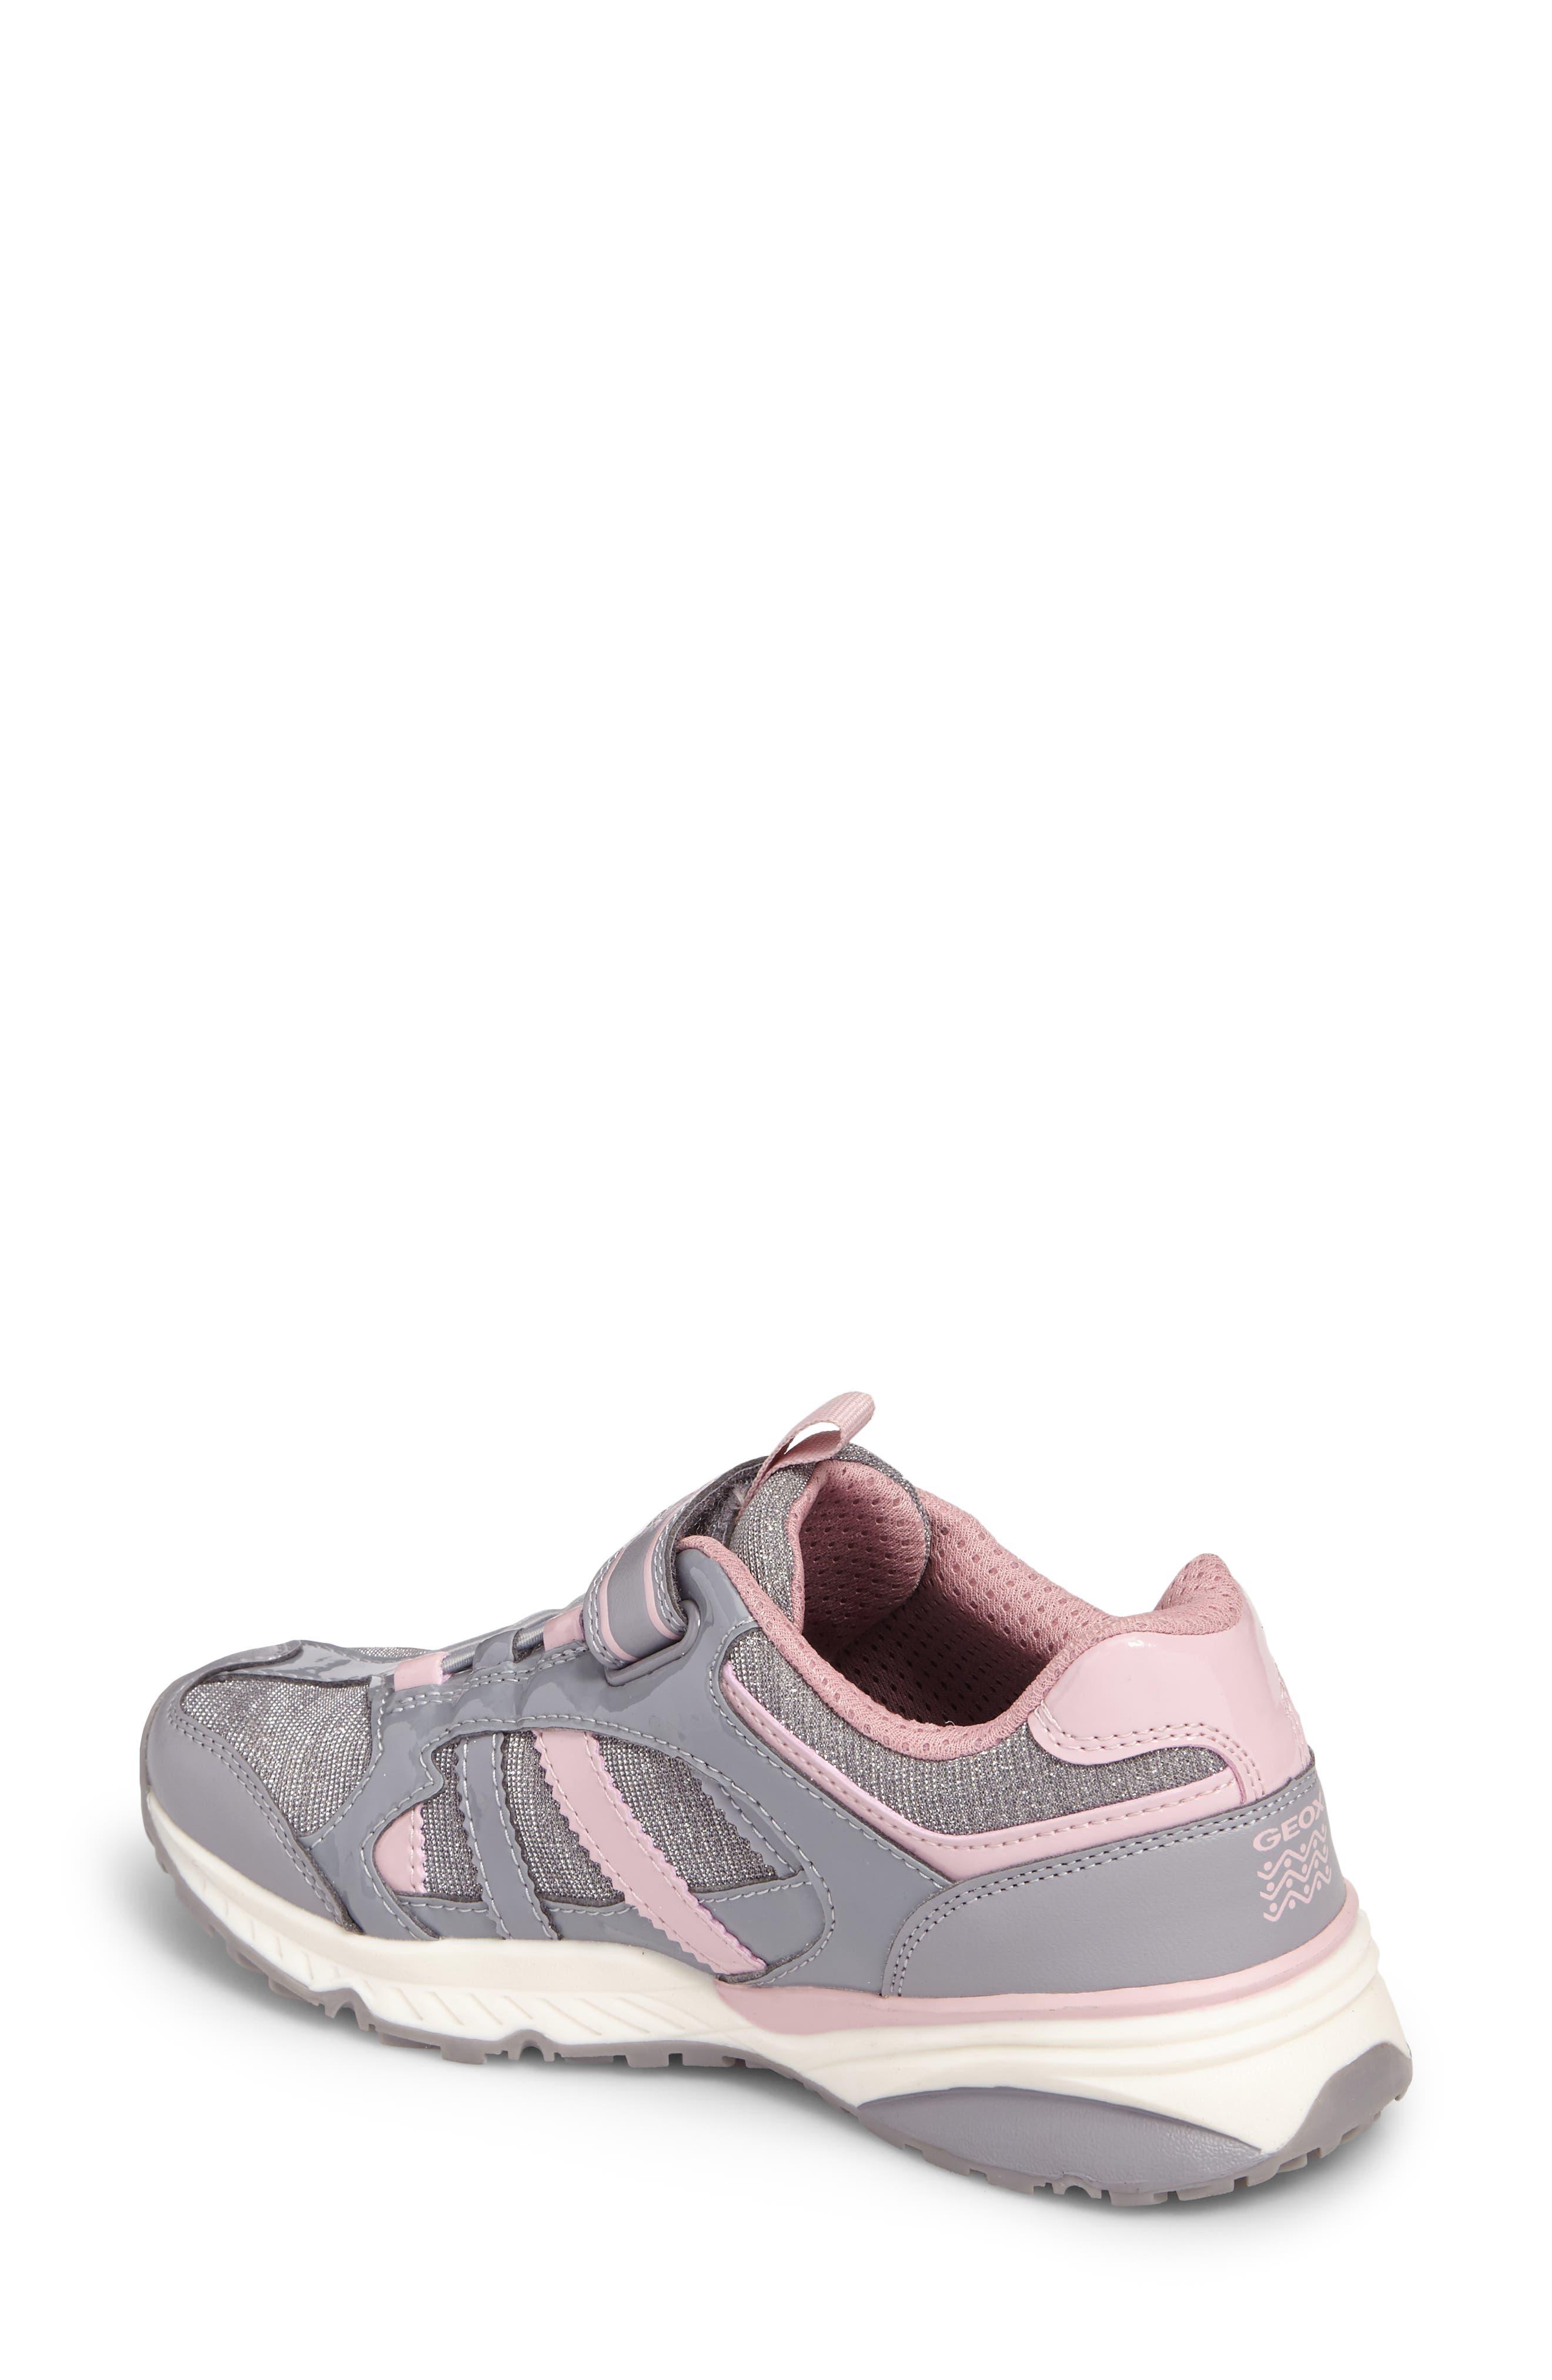 Bernie Sneaker,                             Alternate thumbnail 2, color,                             020